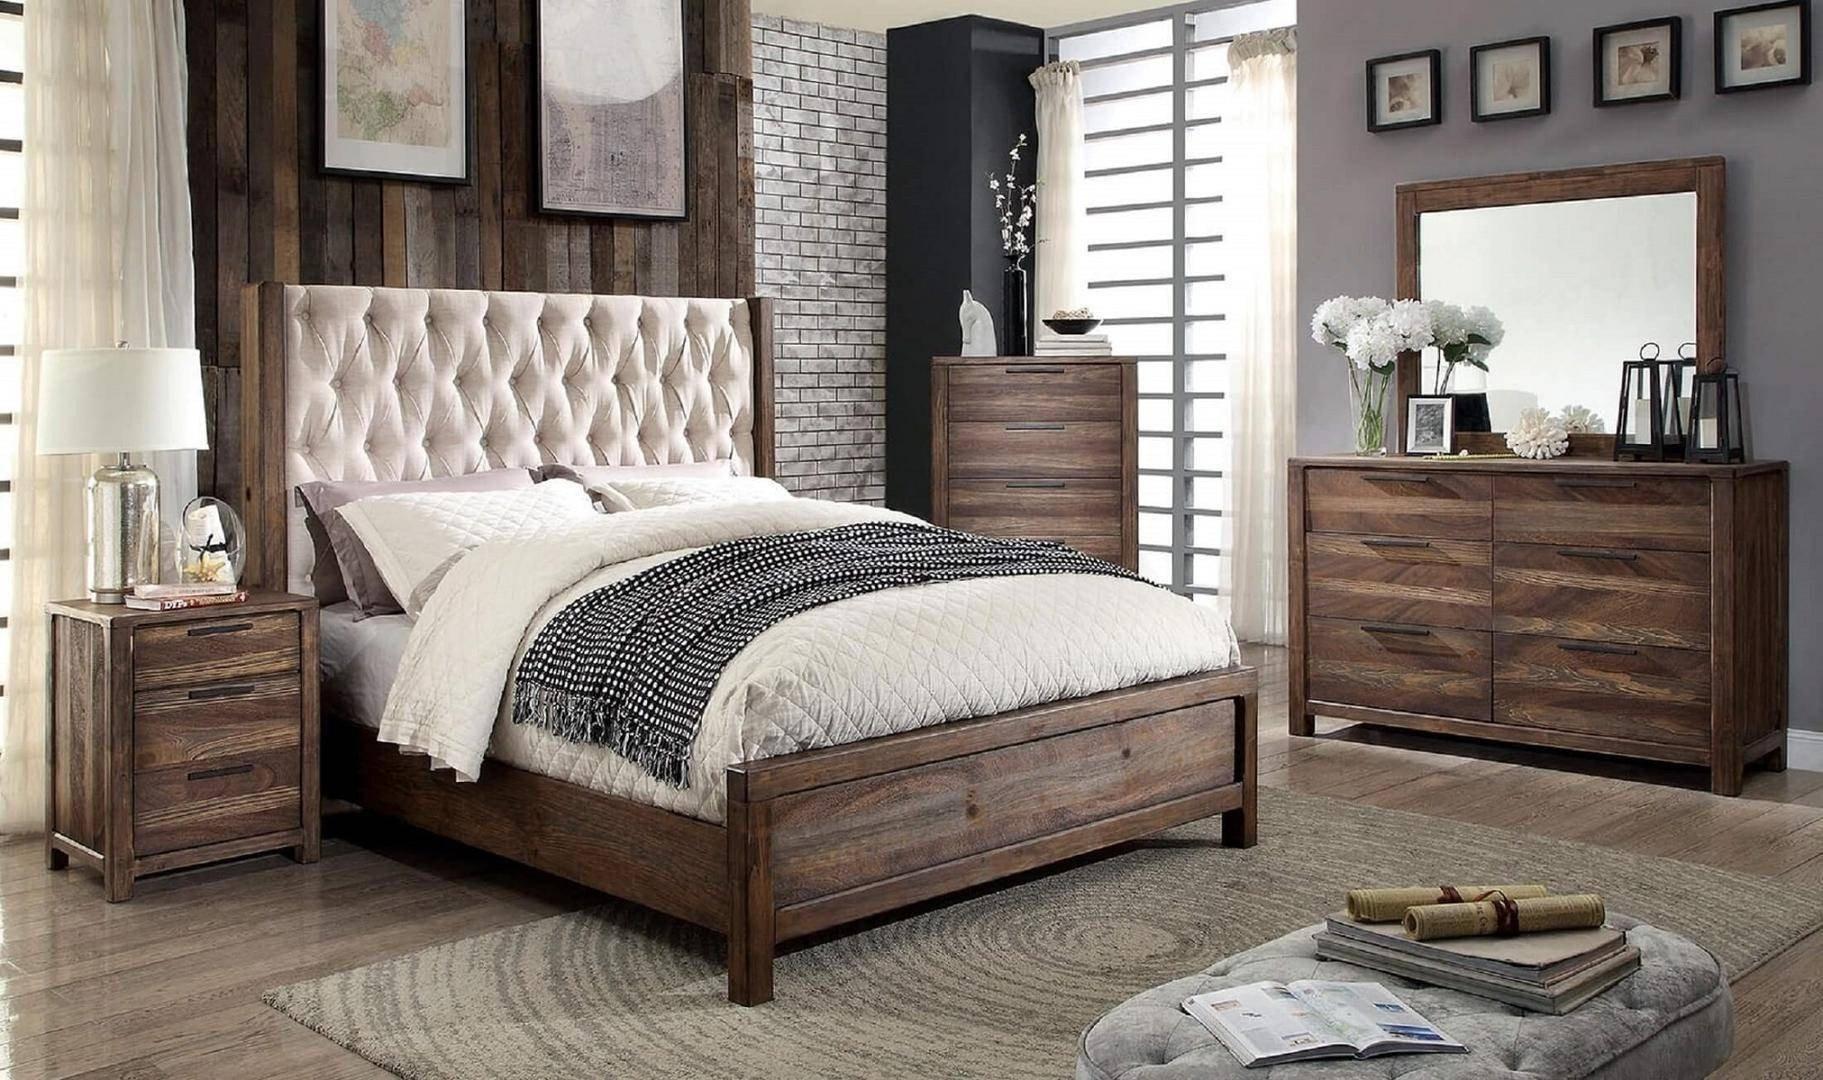 Wooden Bedroom Furniture Set New Rustic Queen Bedroom Set 4 Pcs Brown Hutchinson Furniture Of